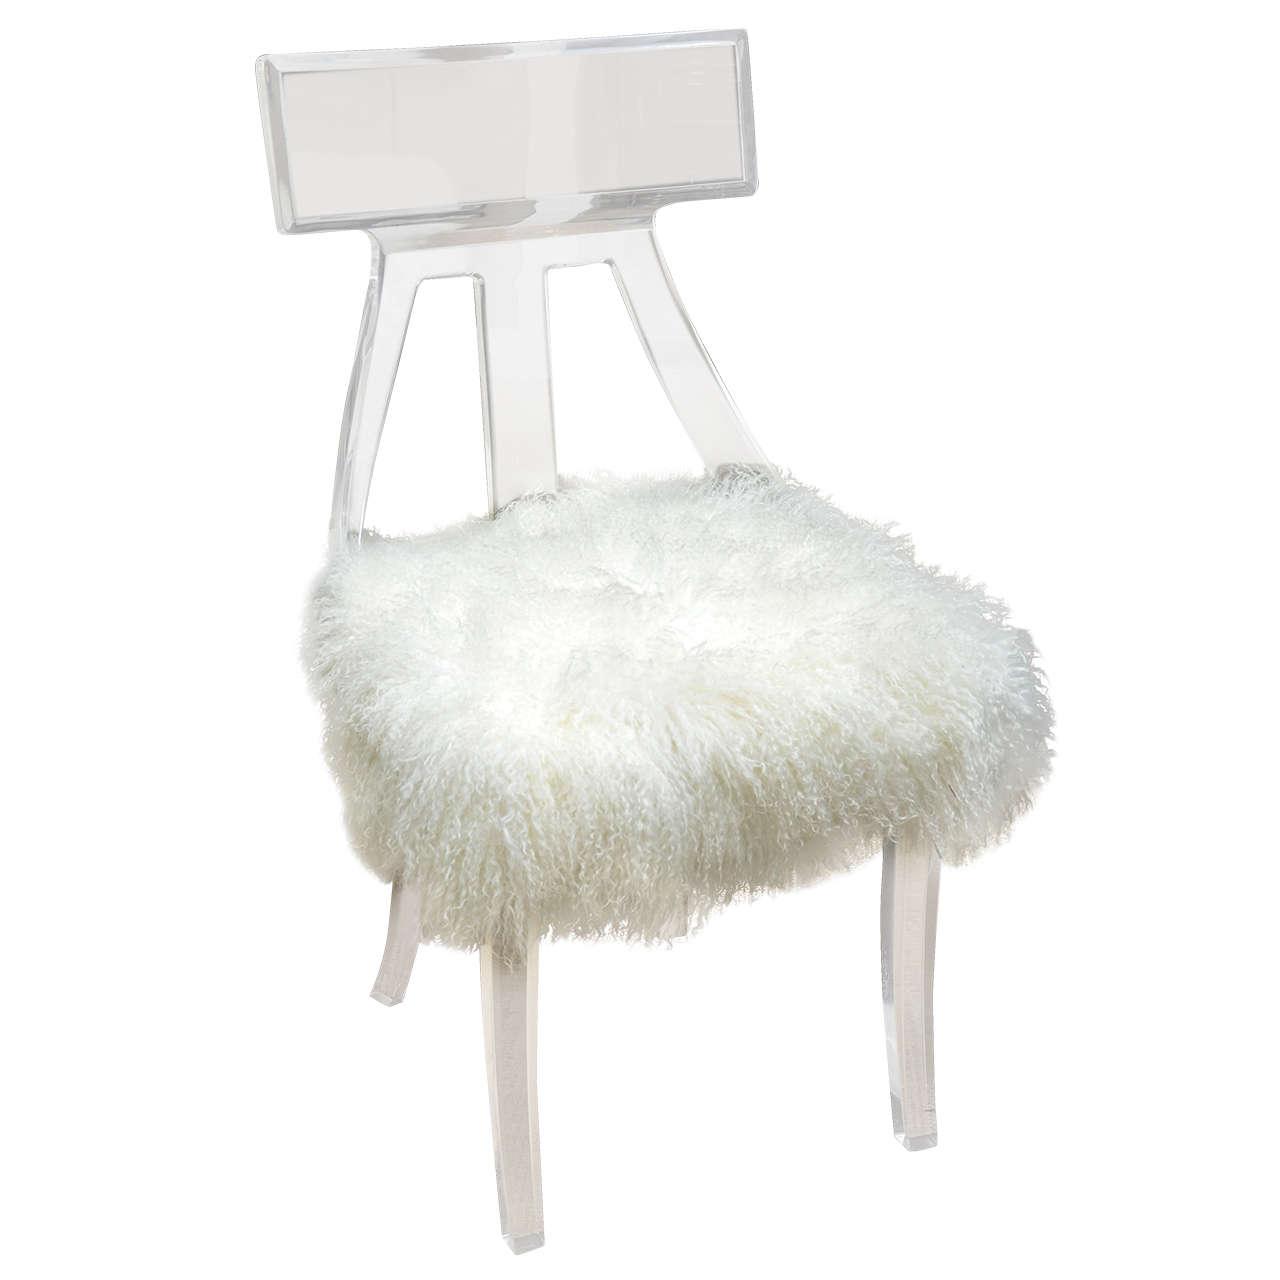 Vintage Lucite Desk Chair Upholstered in Mongolian Lamb at 1stdibs